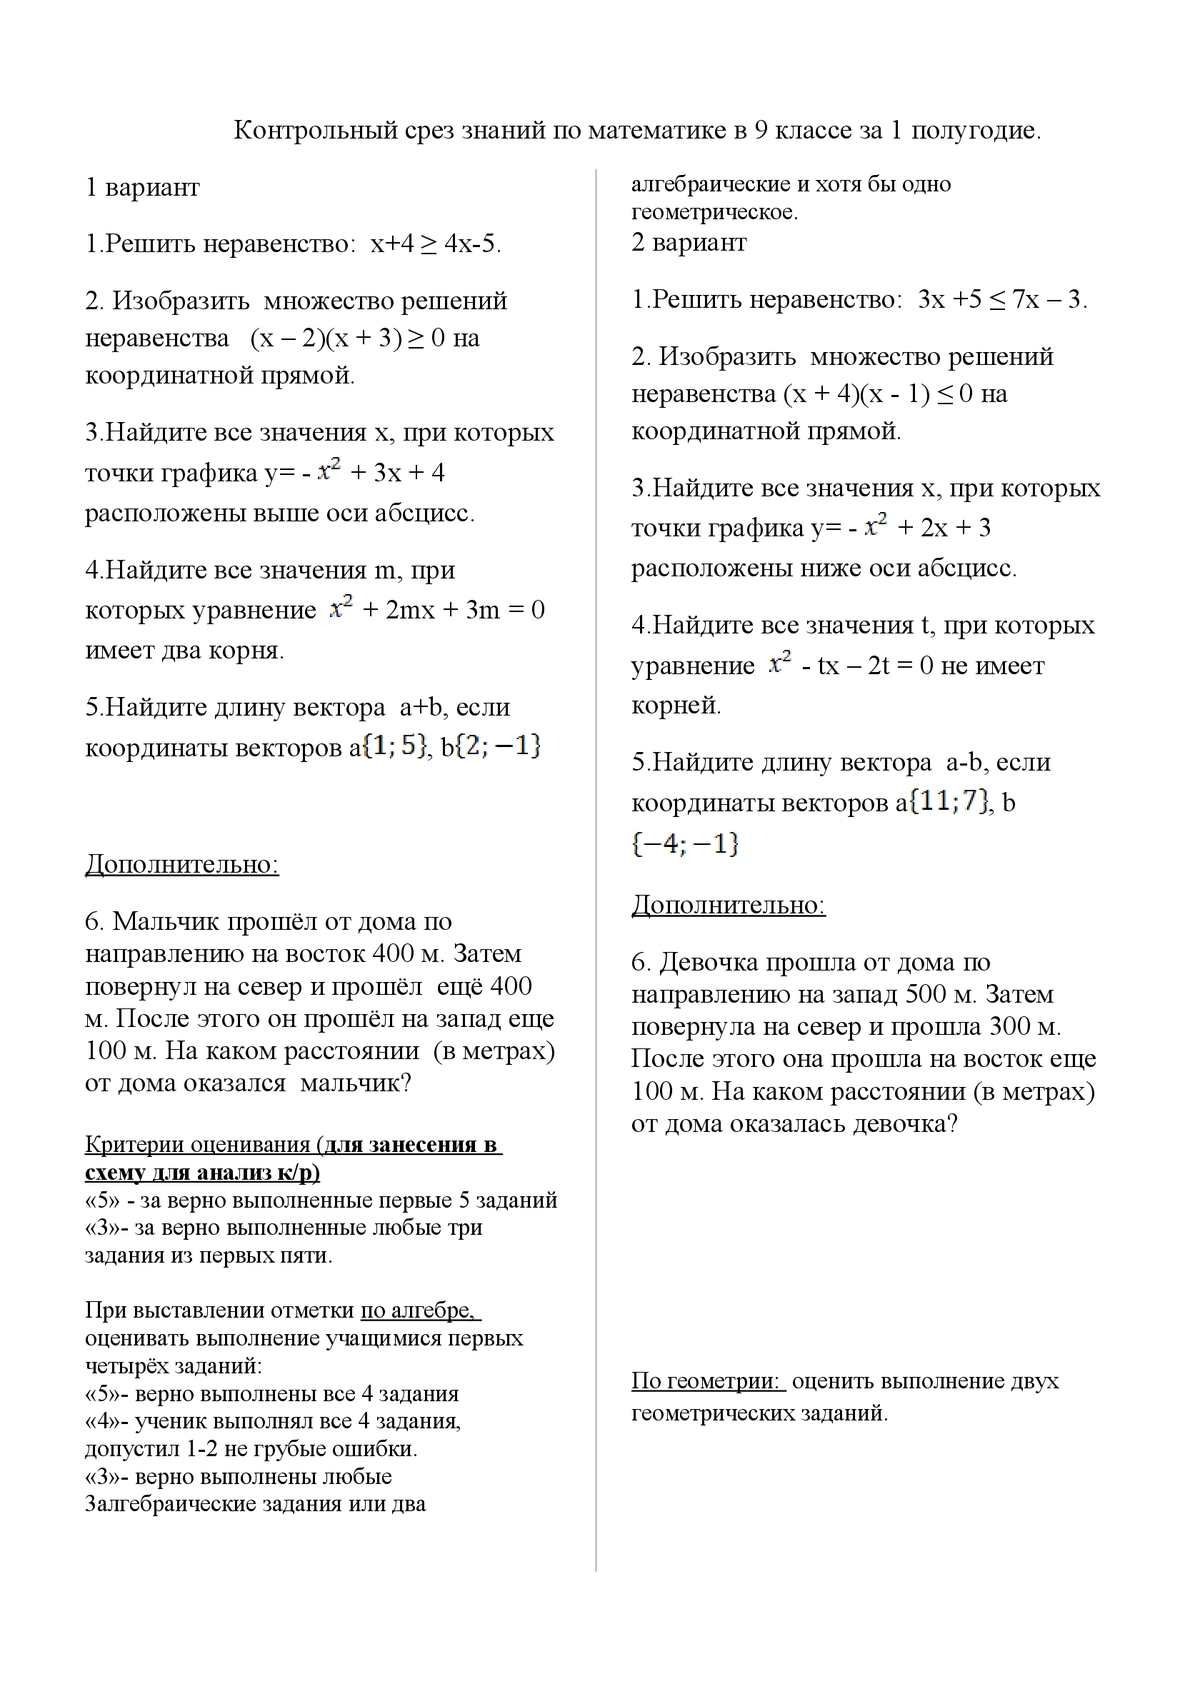 Срез по математике 9 класс